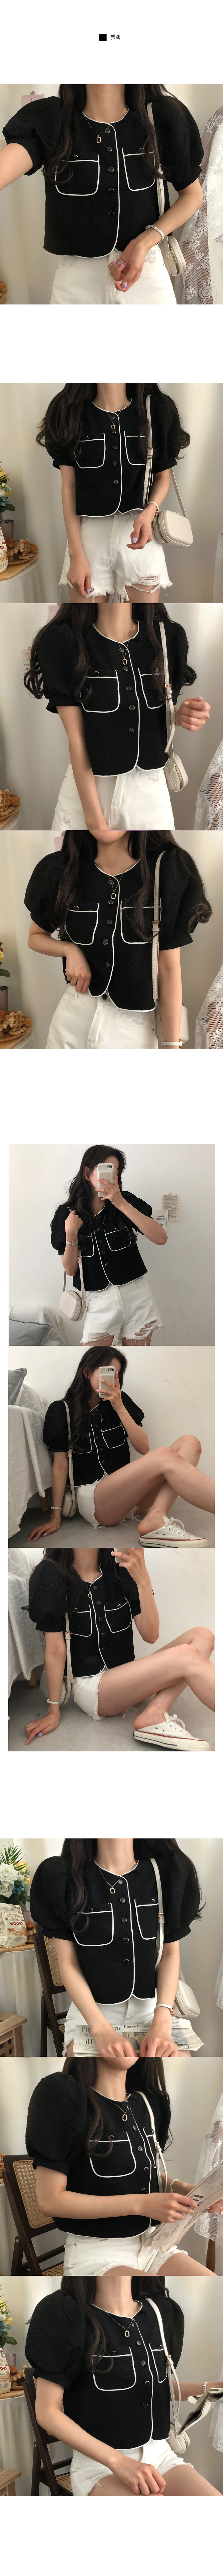 Light fabric blanc color matching short sleeve blouse